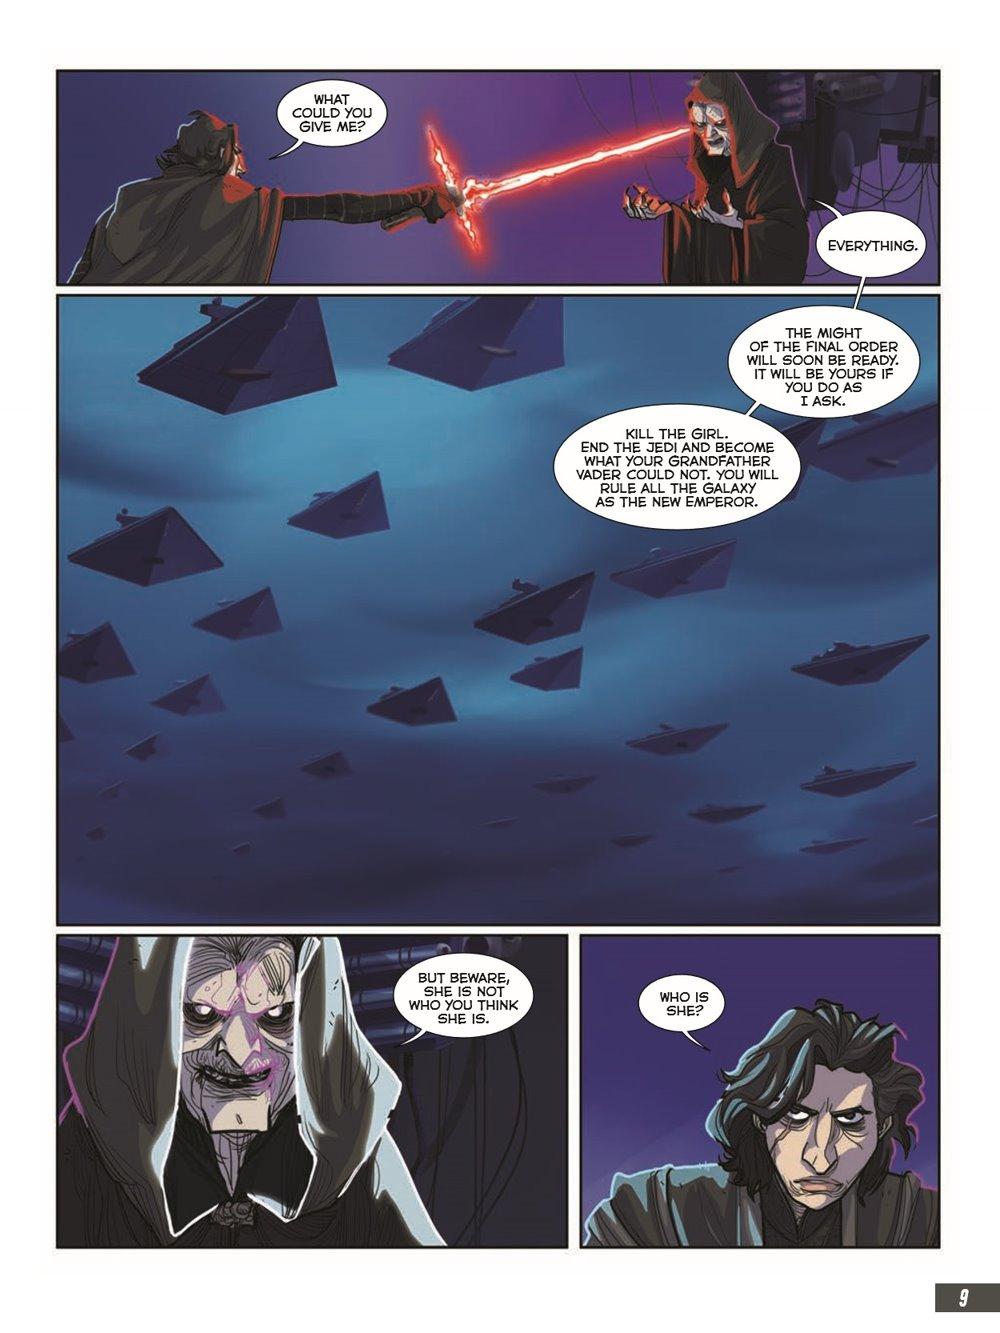 StarWars_IX_TheRiseOfSkywalker_pr-5 ComicList Previews: STAR WARS THE RISE OF SKYWALKER GN